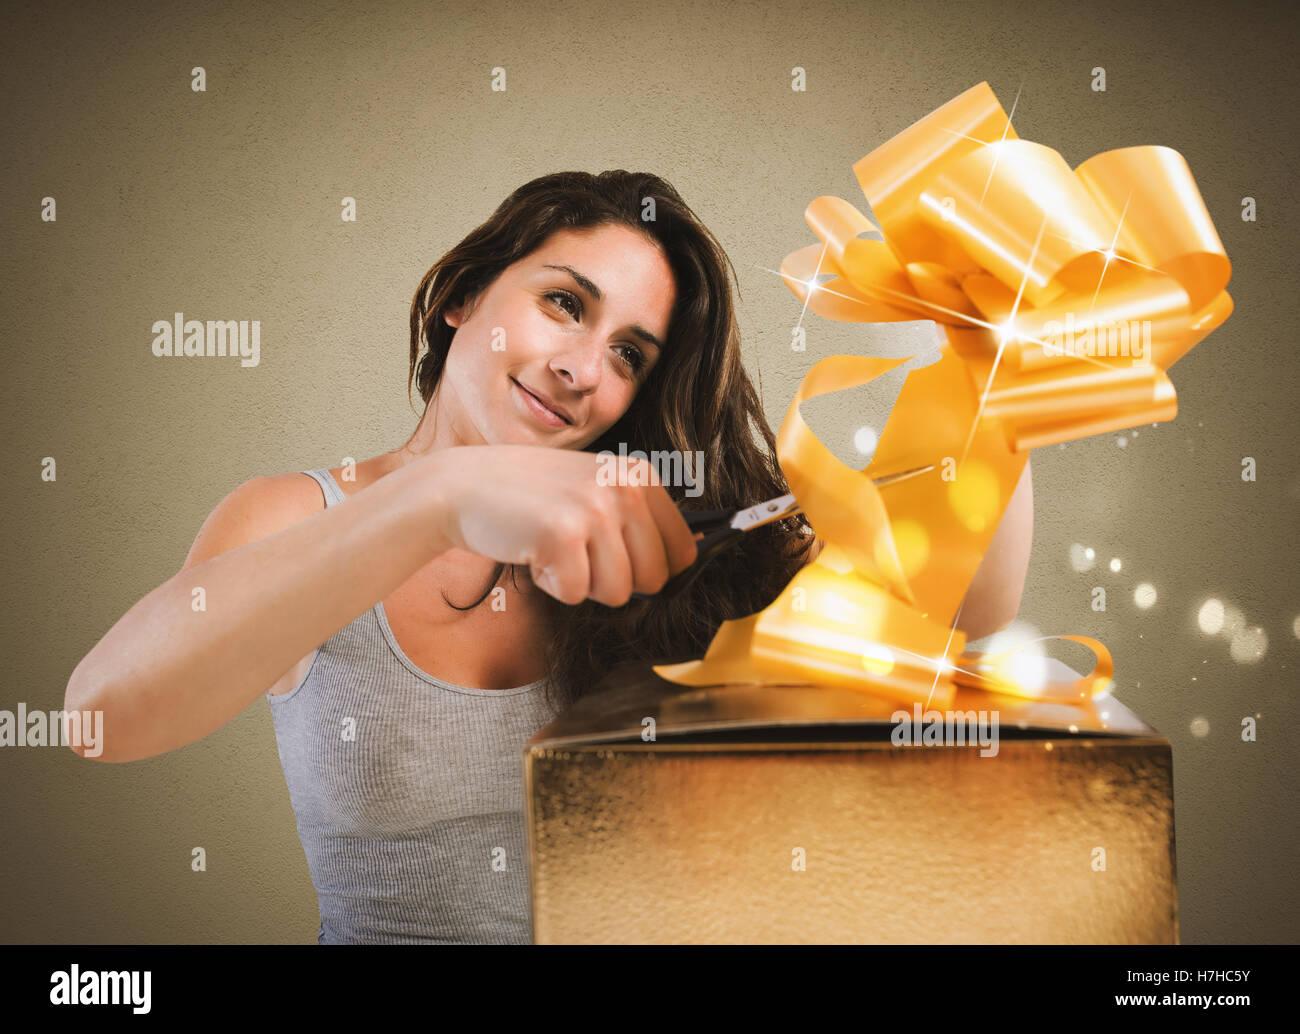 Xmas Geschenke vorbereiten Stockbild